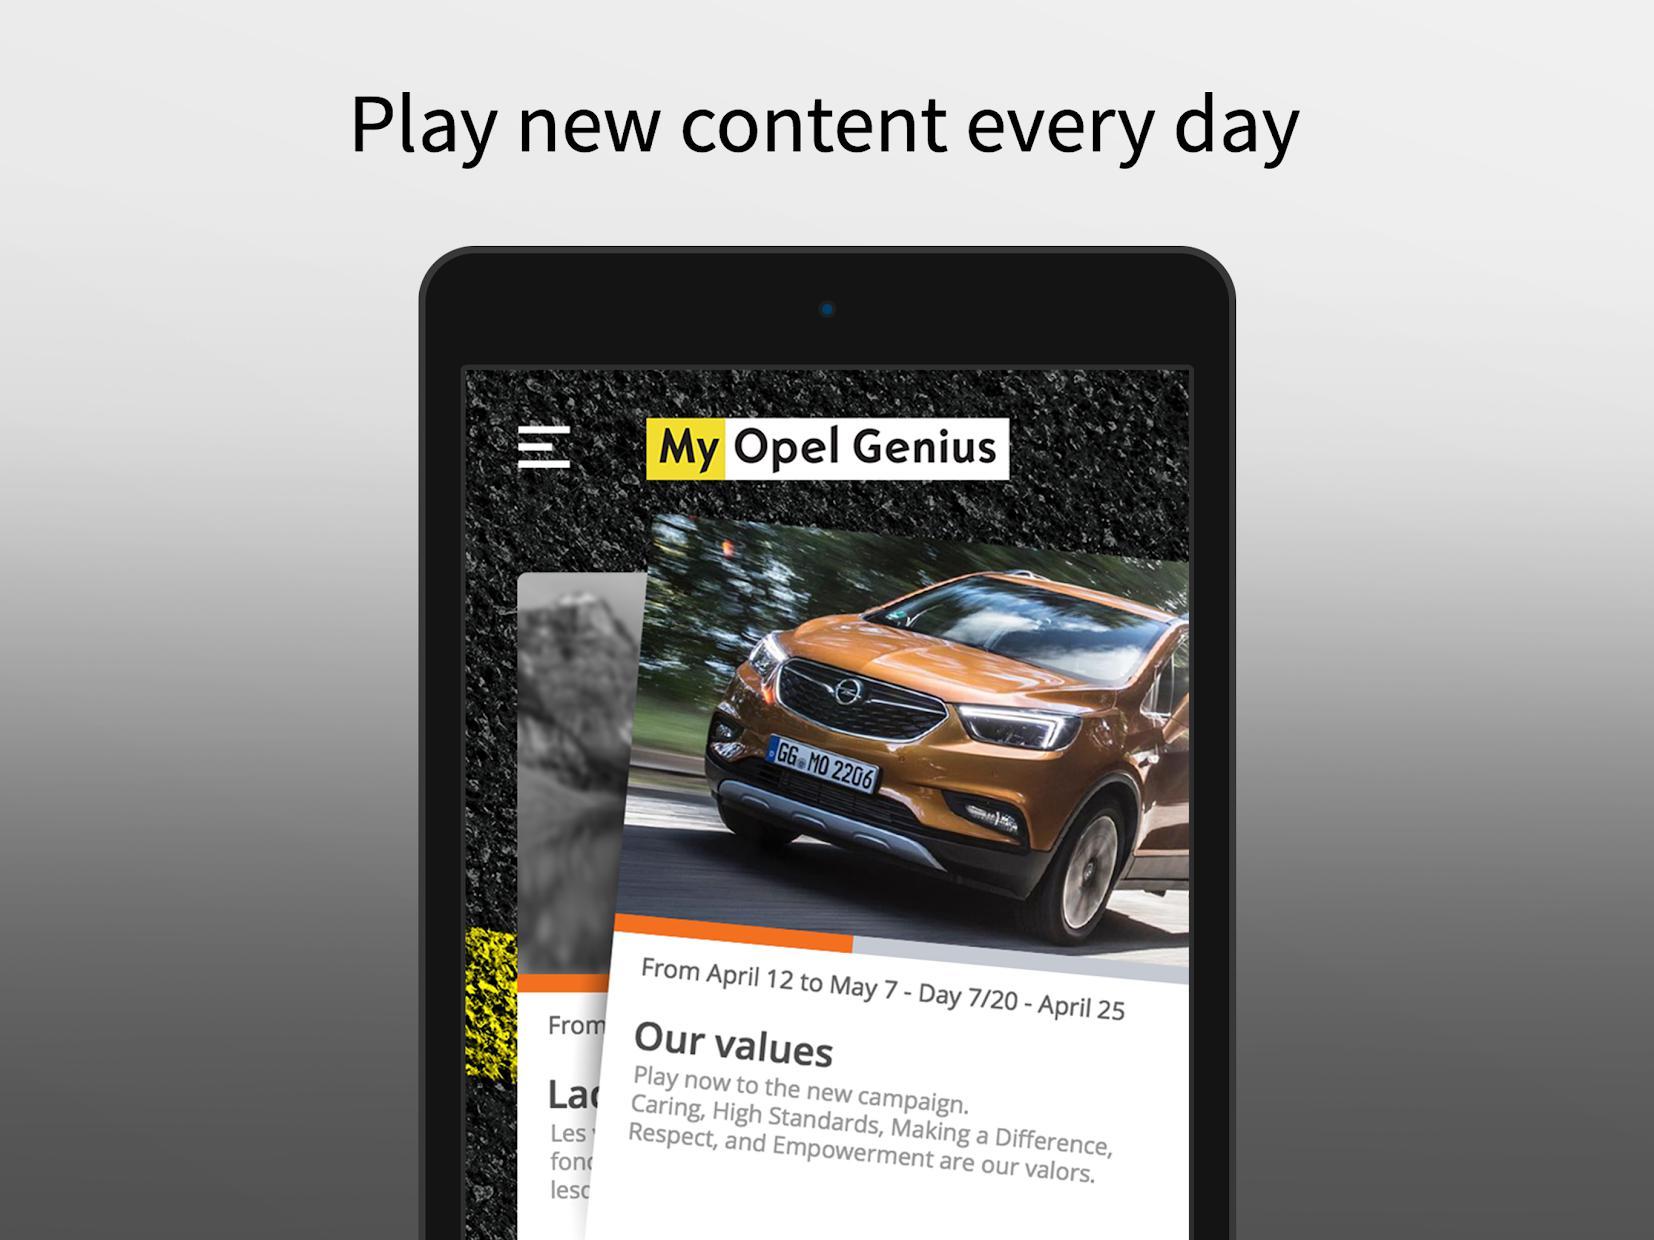 My Opel Genius 游戏截图5